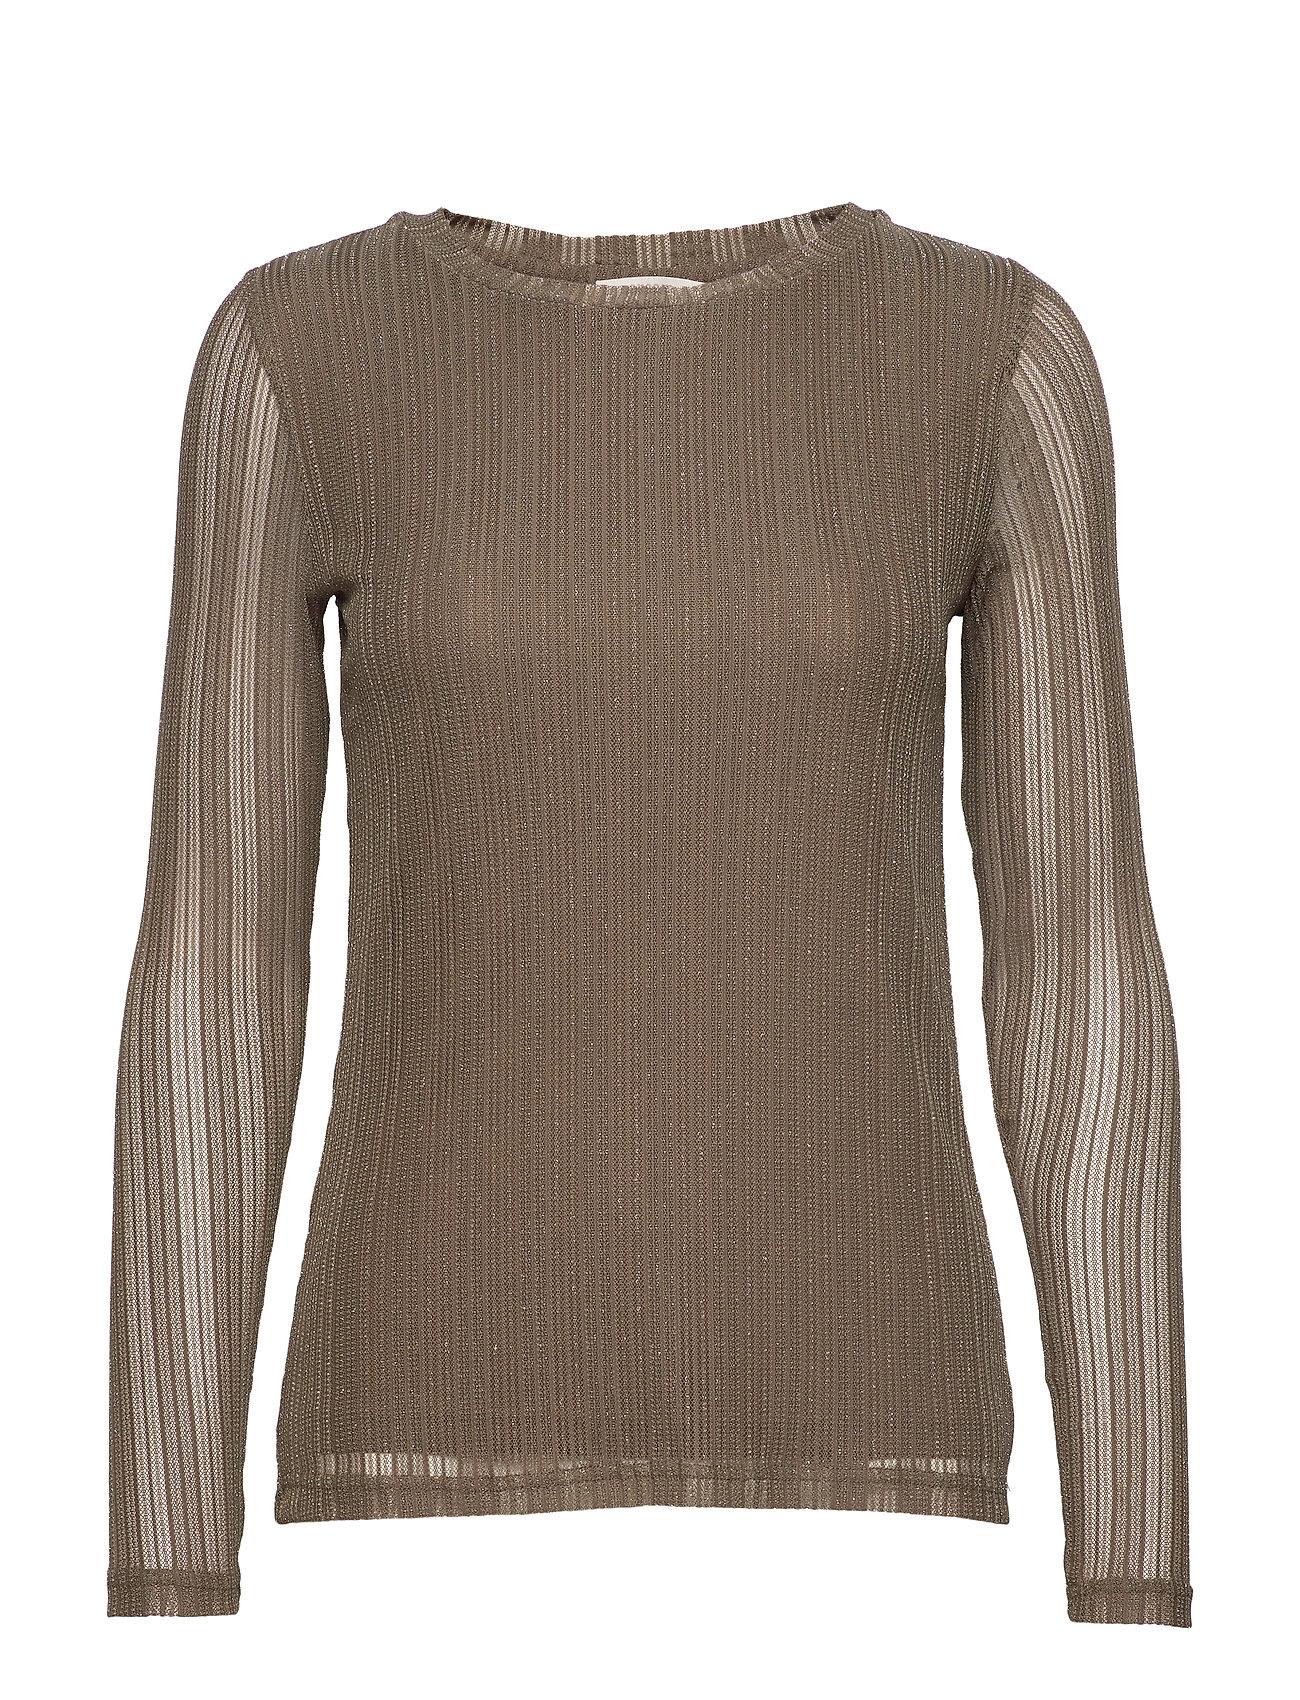 Zoecr GreenCream Long Sleeve T shirtsea ikZOXPuT